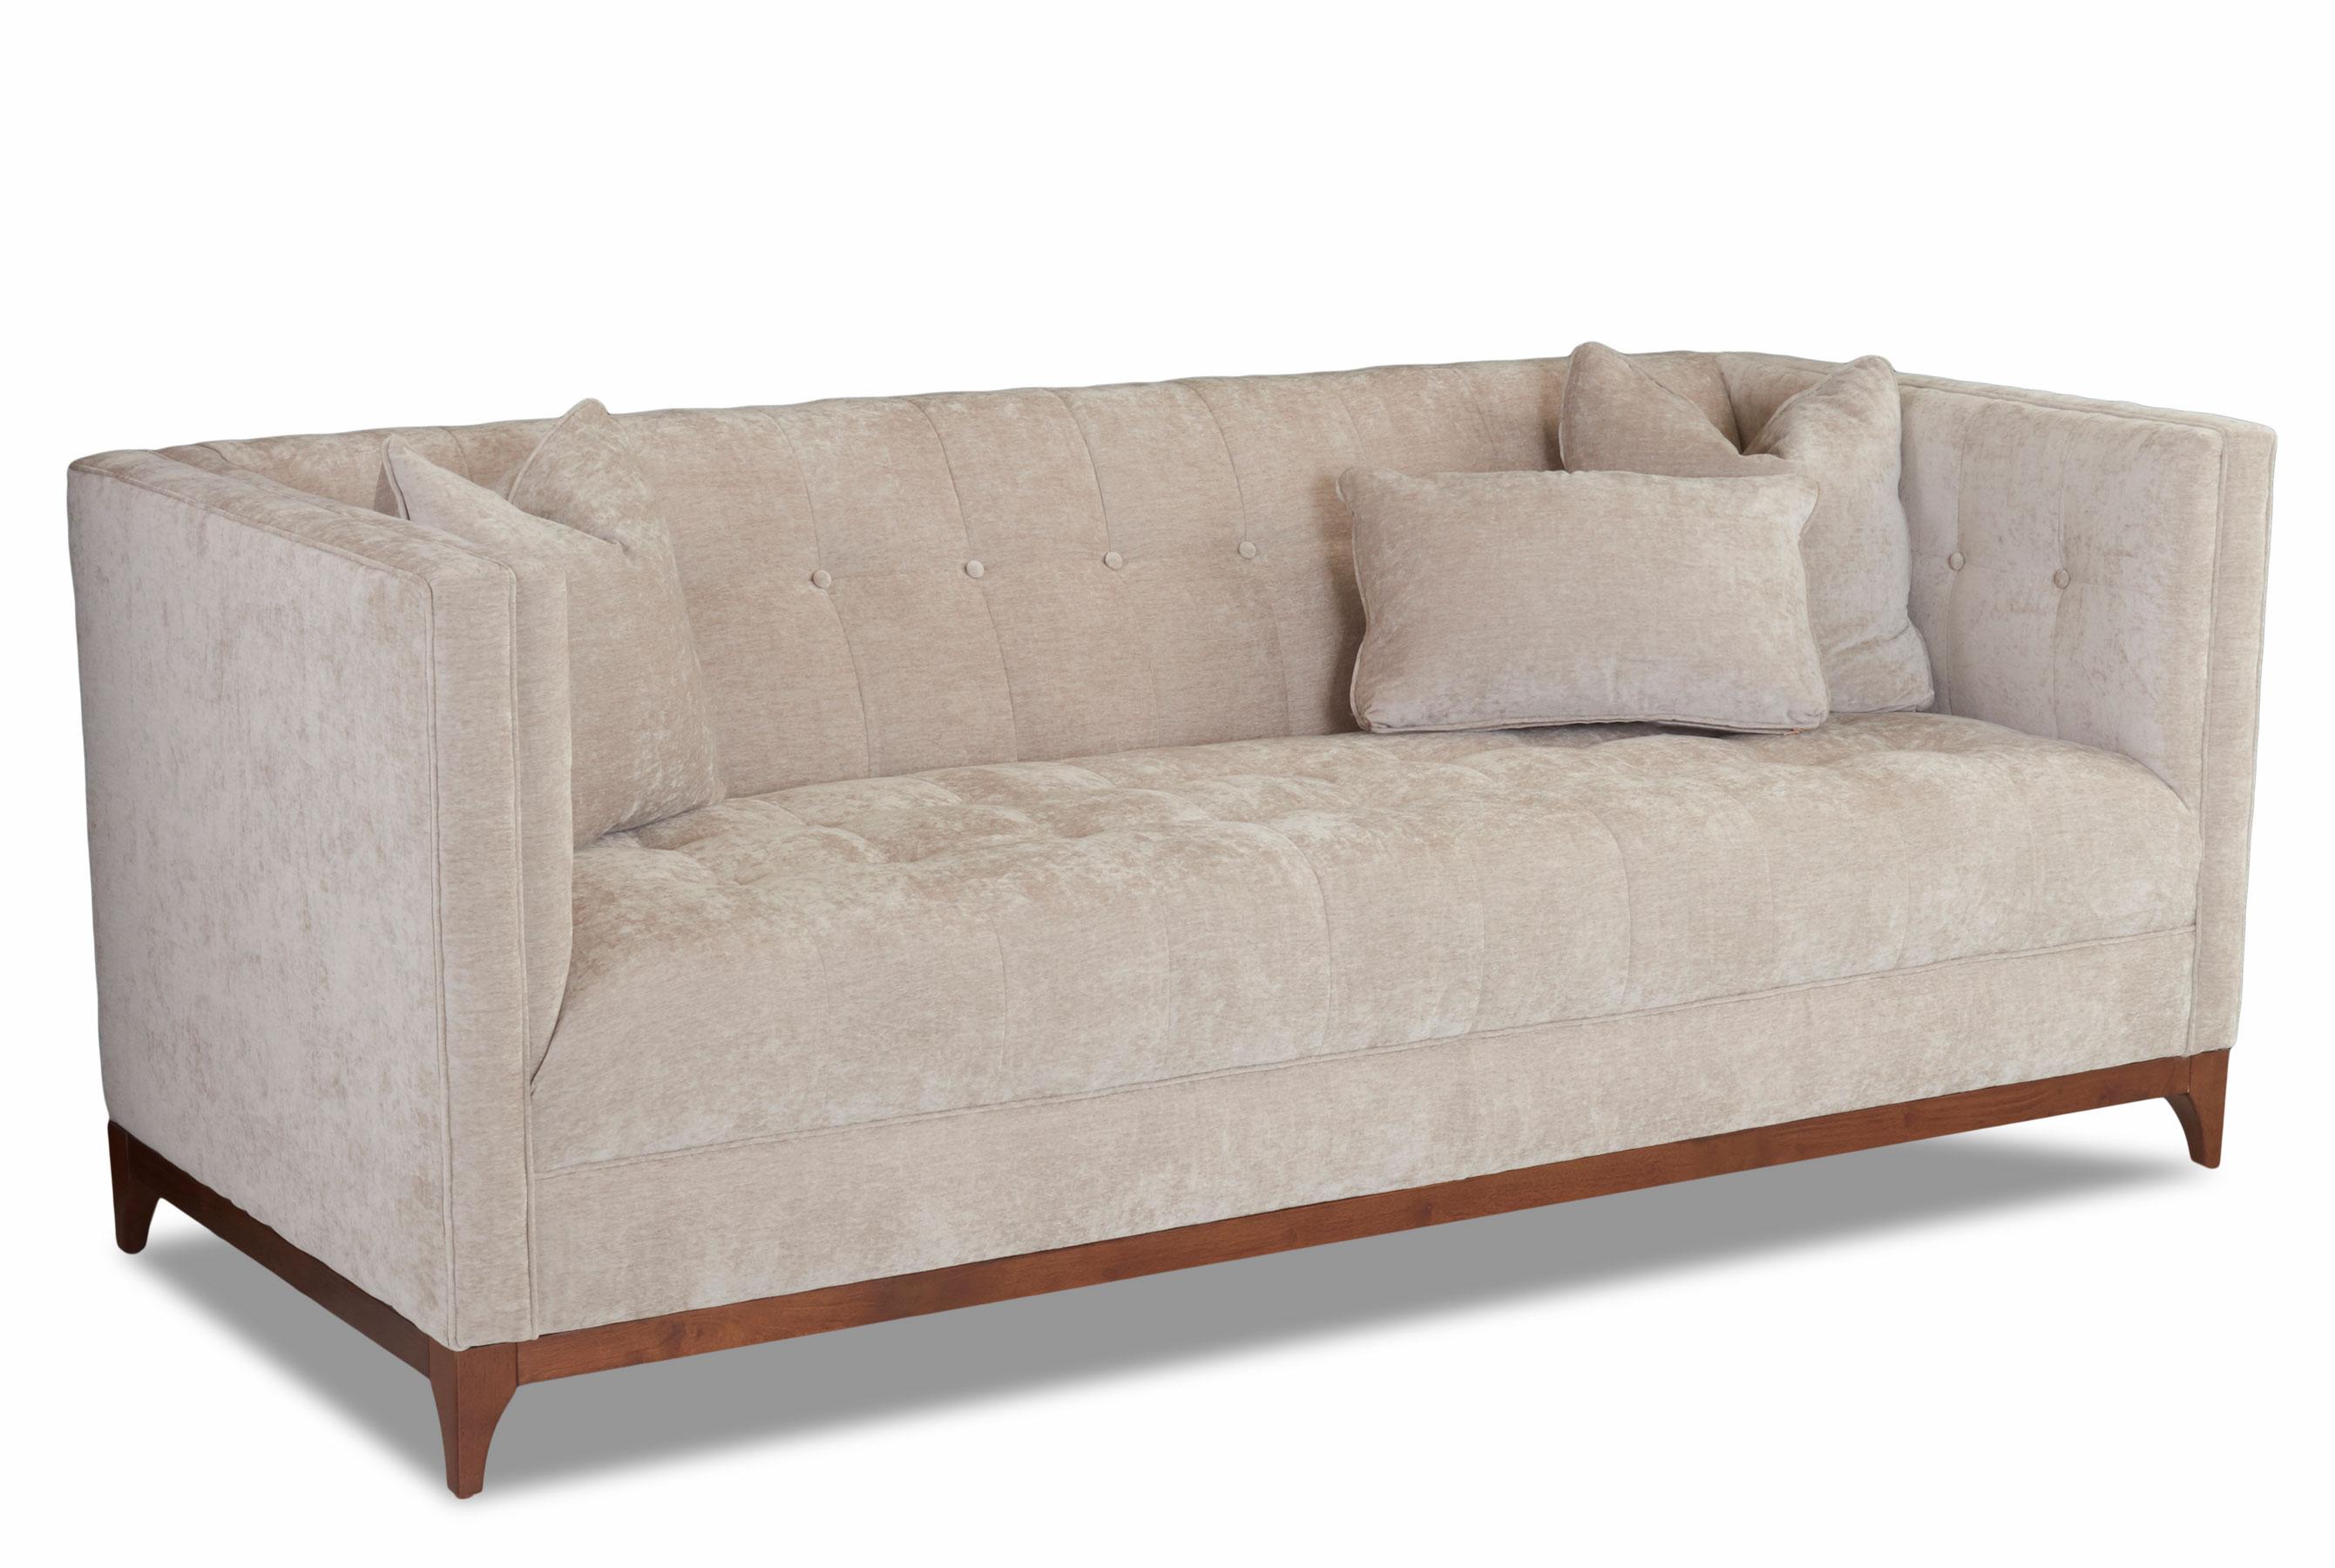 Enjoyable Boulevard 86 Sofa W Down Cushions Sofas And Sectionals Inzonedesignstudio Interior Chair Design Inzonedesignstudiocom